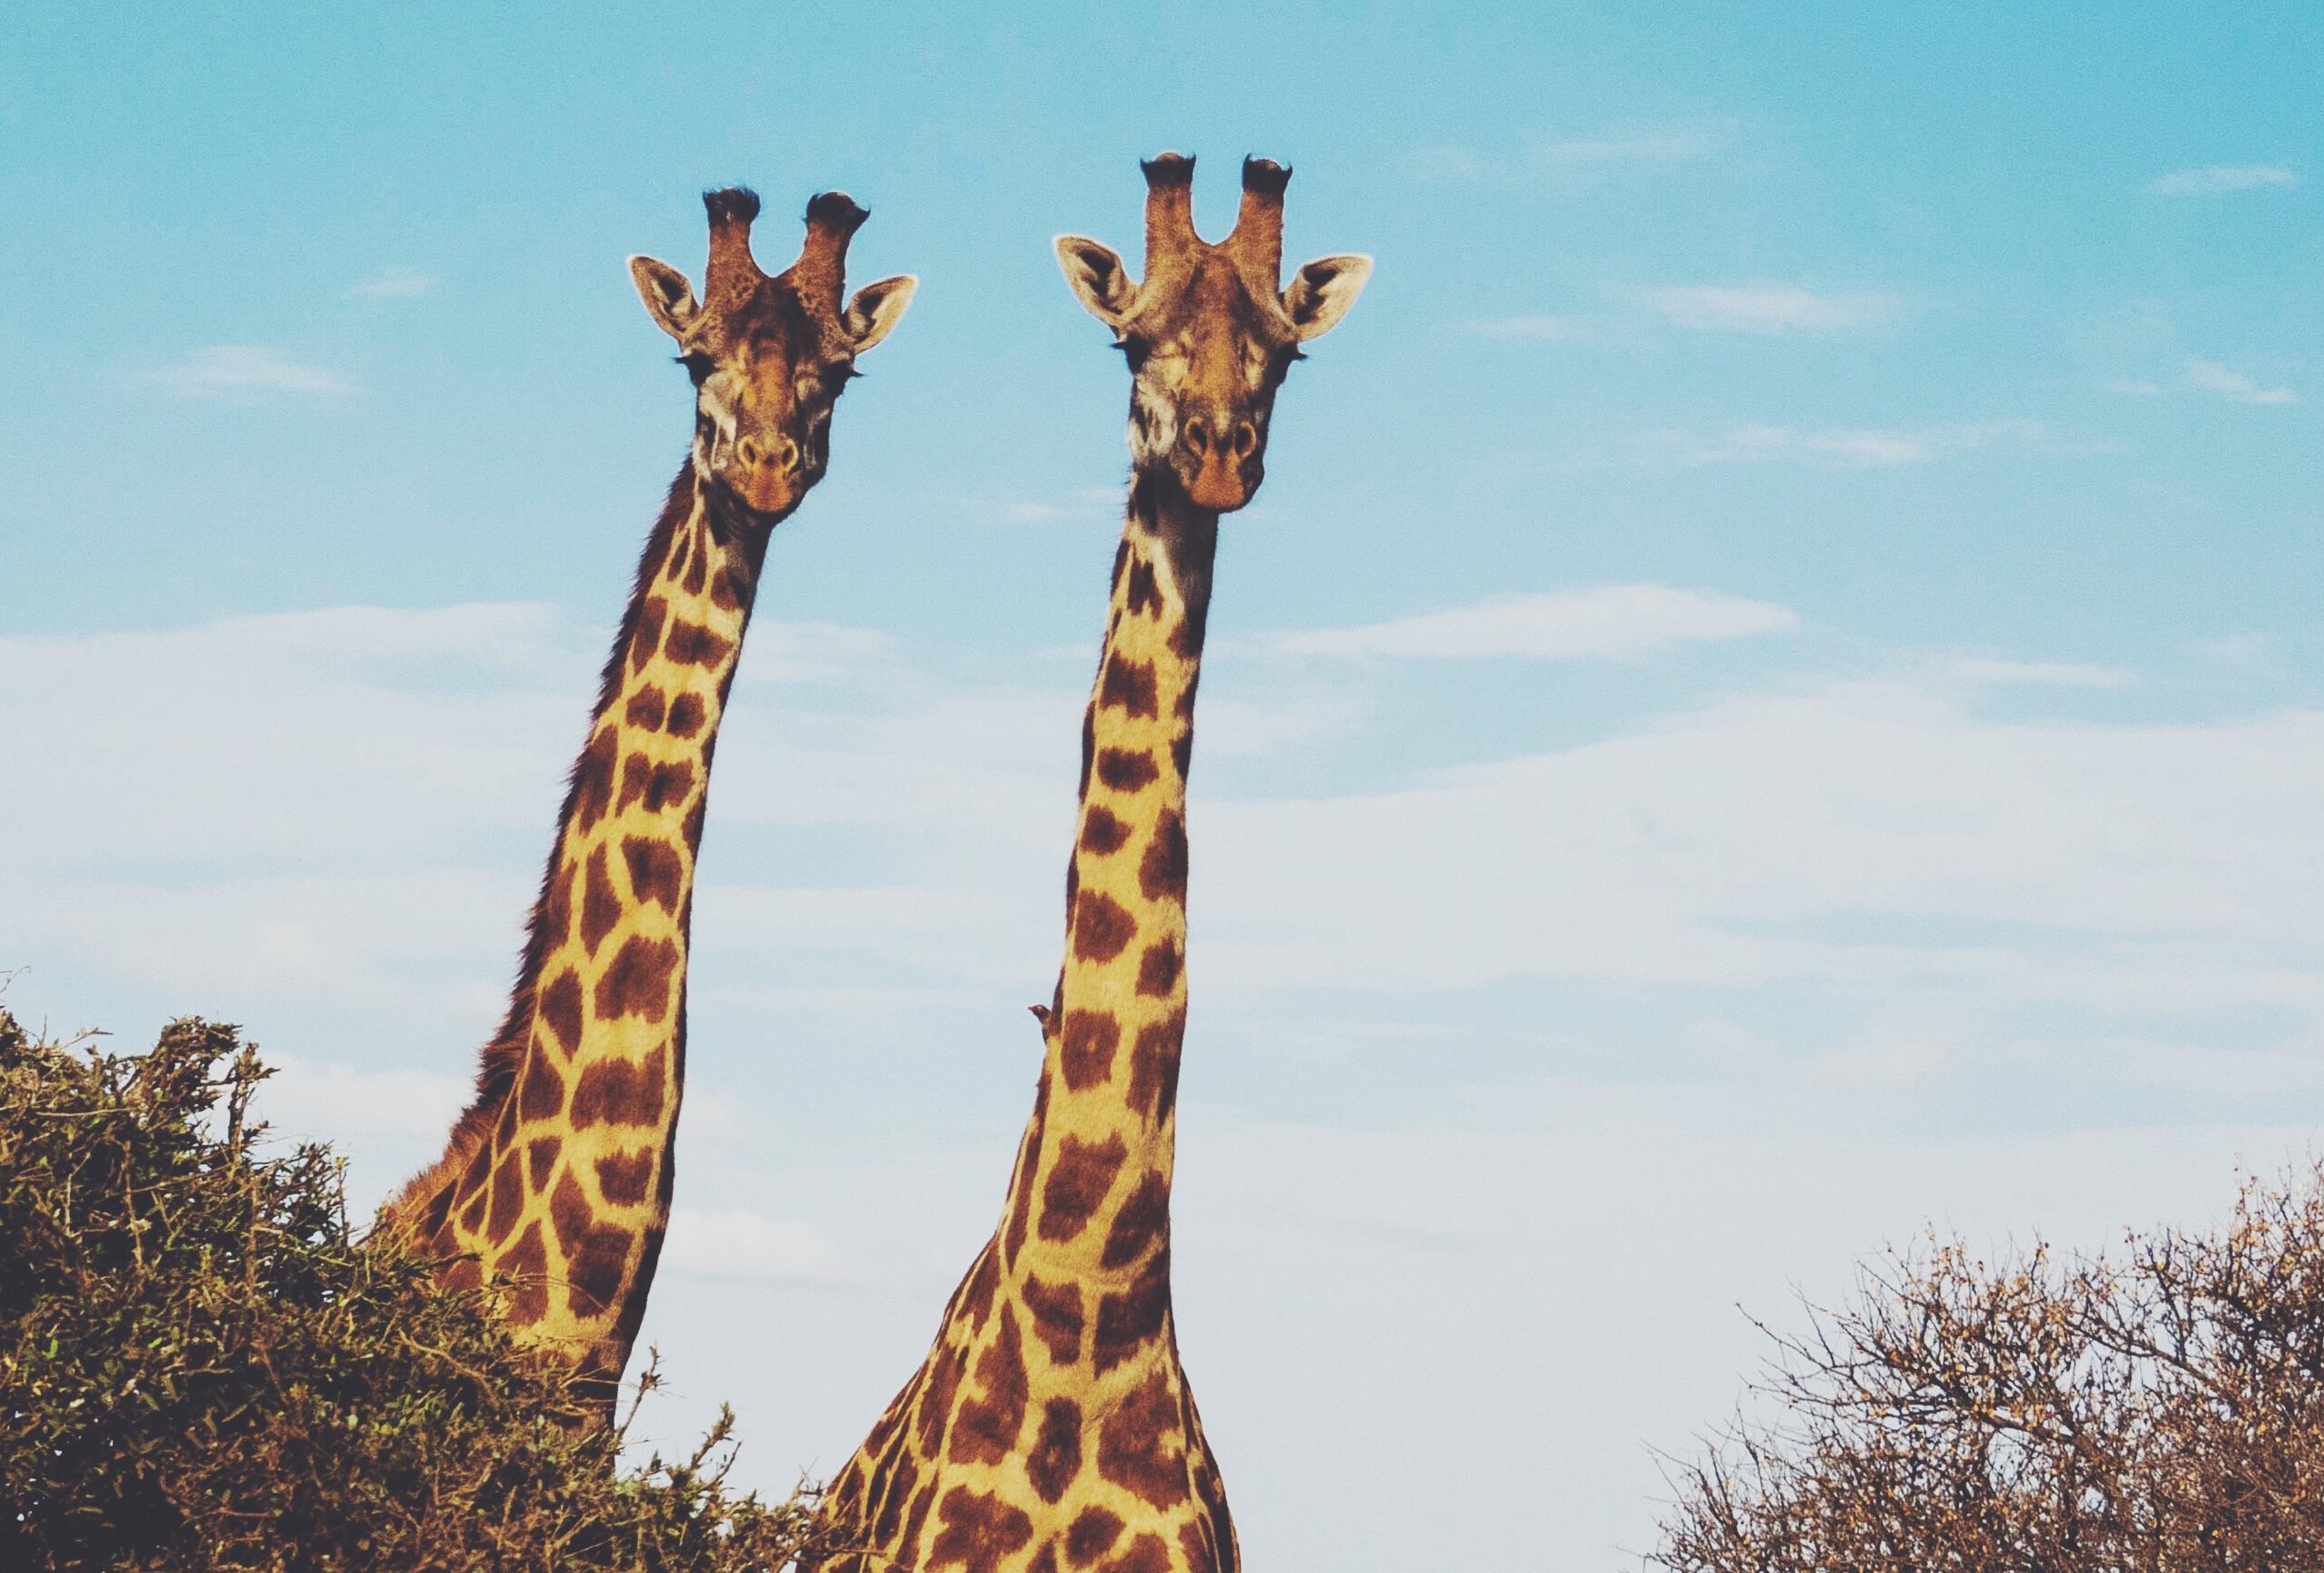 How the giraffe got its long neck | Cosmos